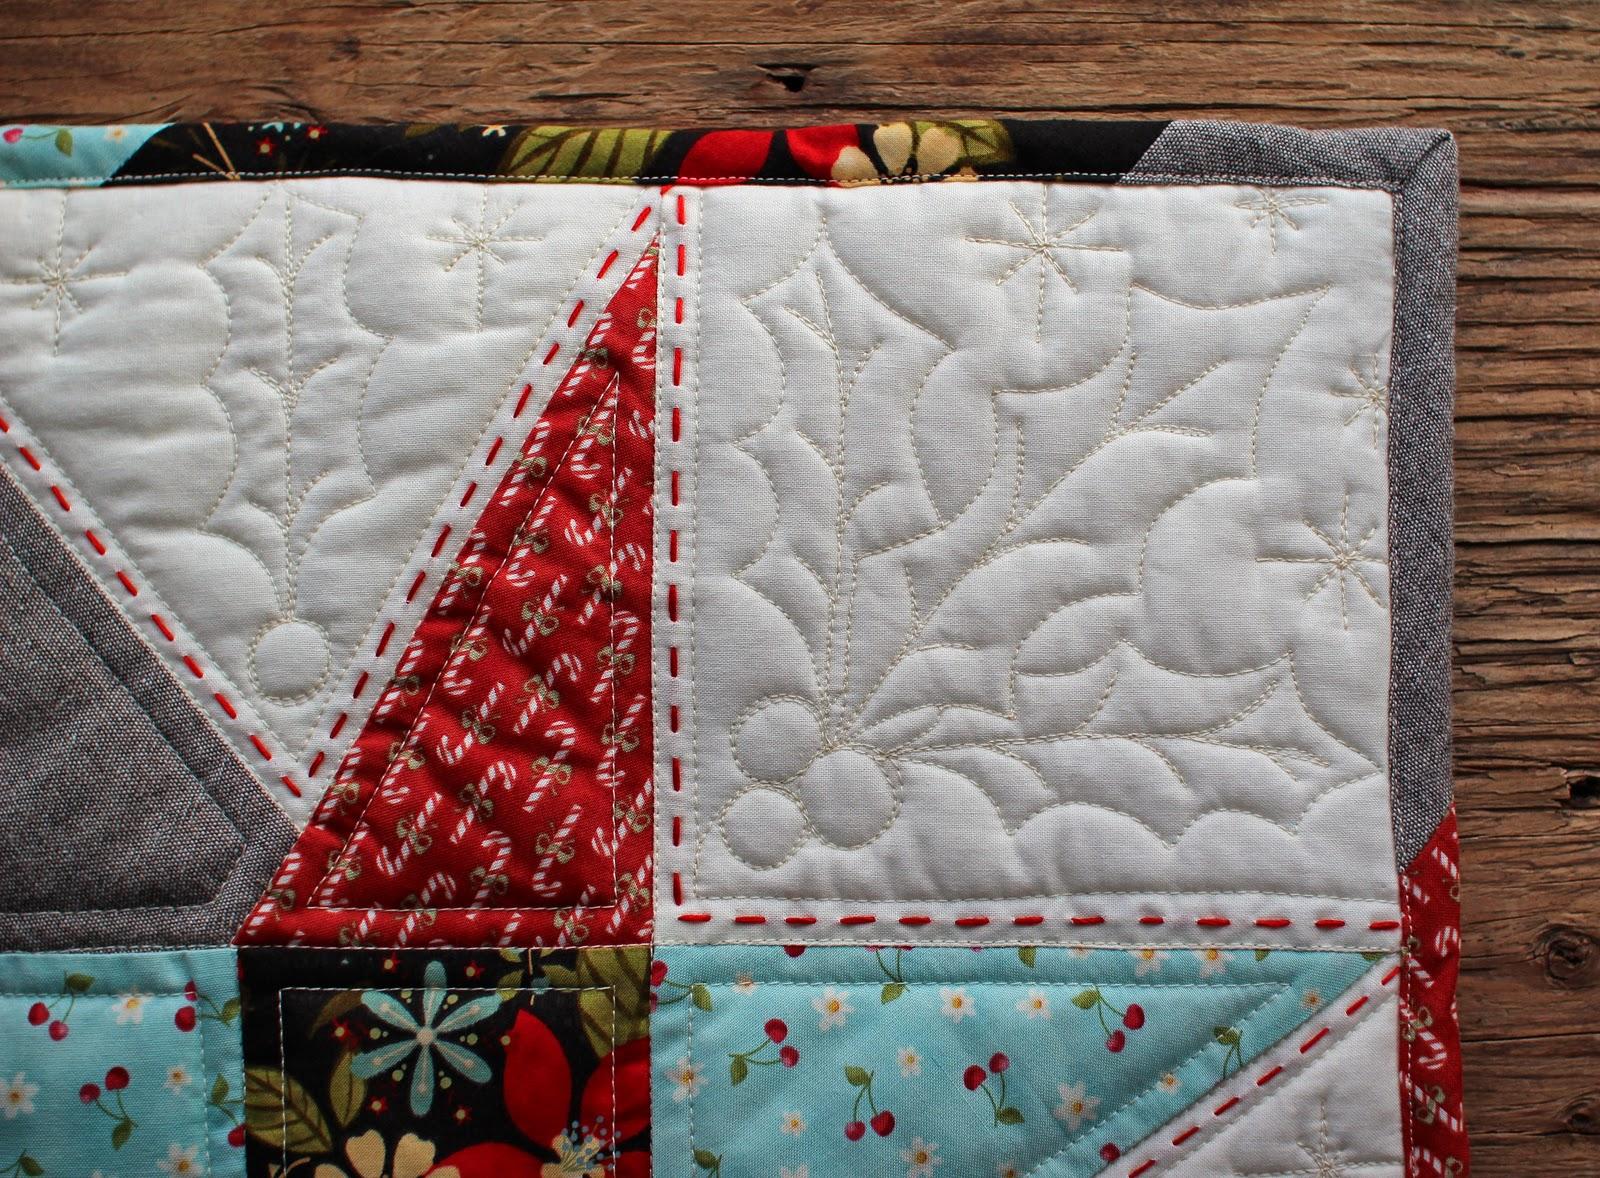 Christmas Star Pillow & PatchworkPottery: Christmas Star Pillow pillowsntoast.com